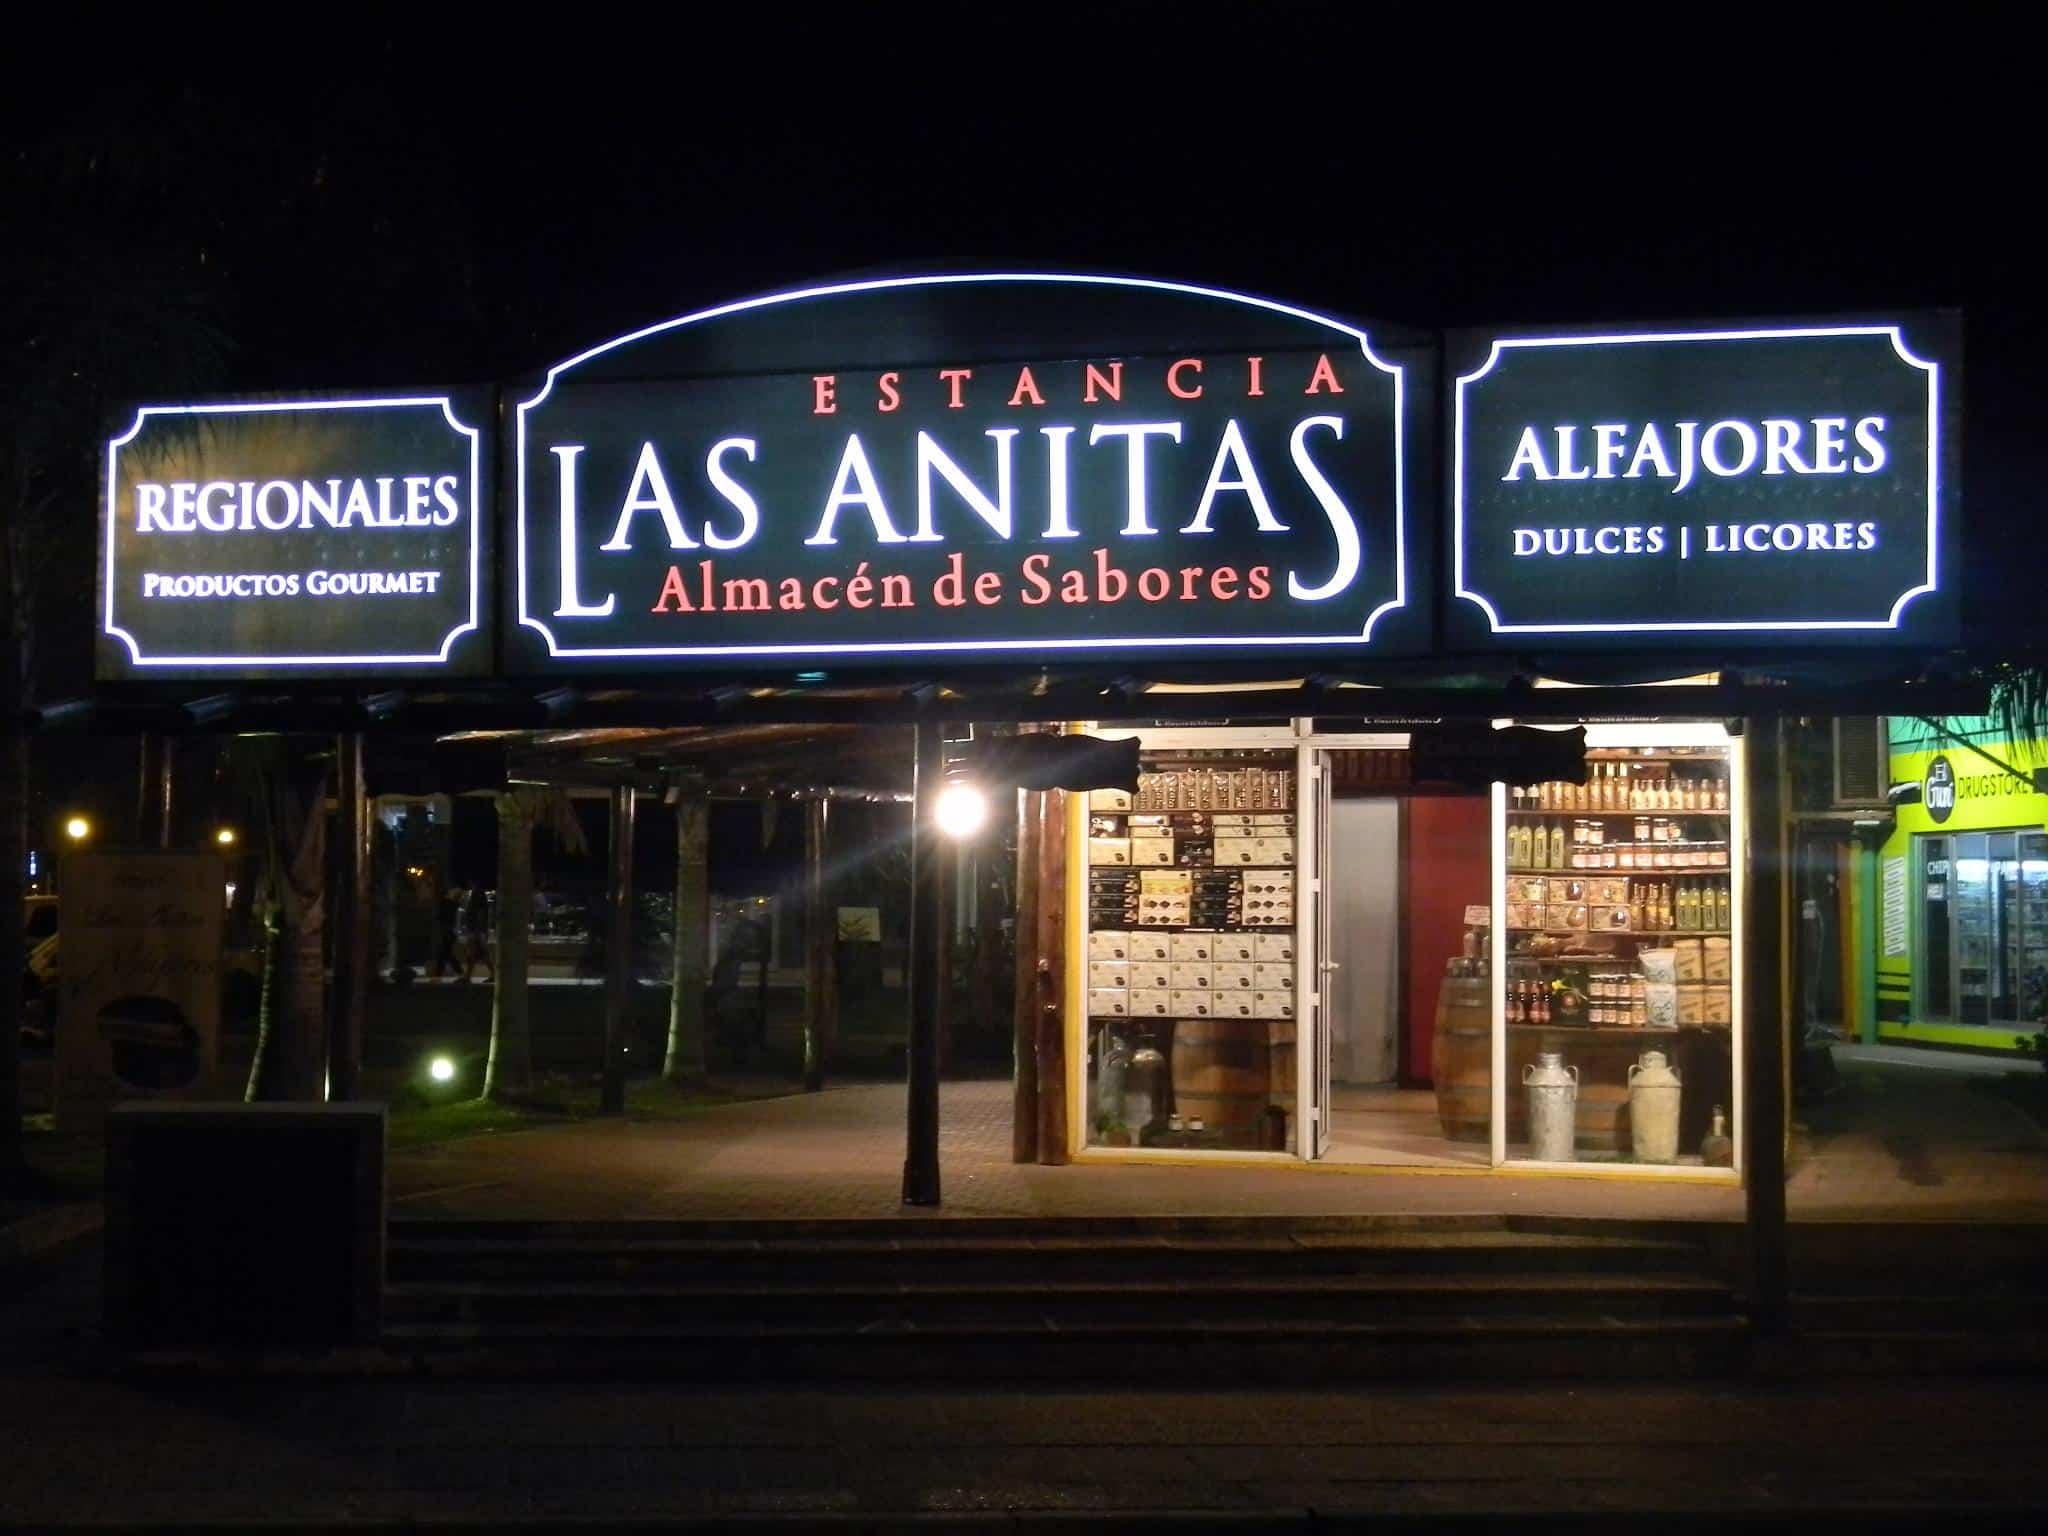 Estancia Las Anitas